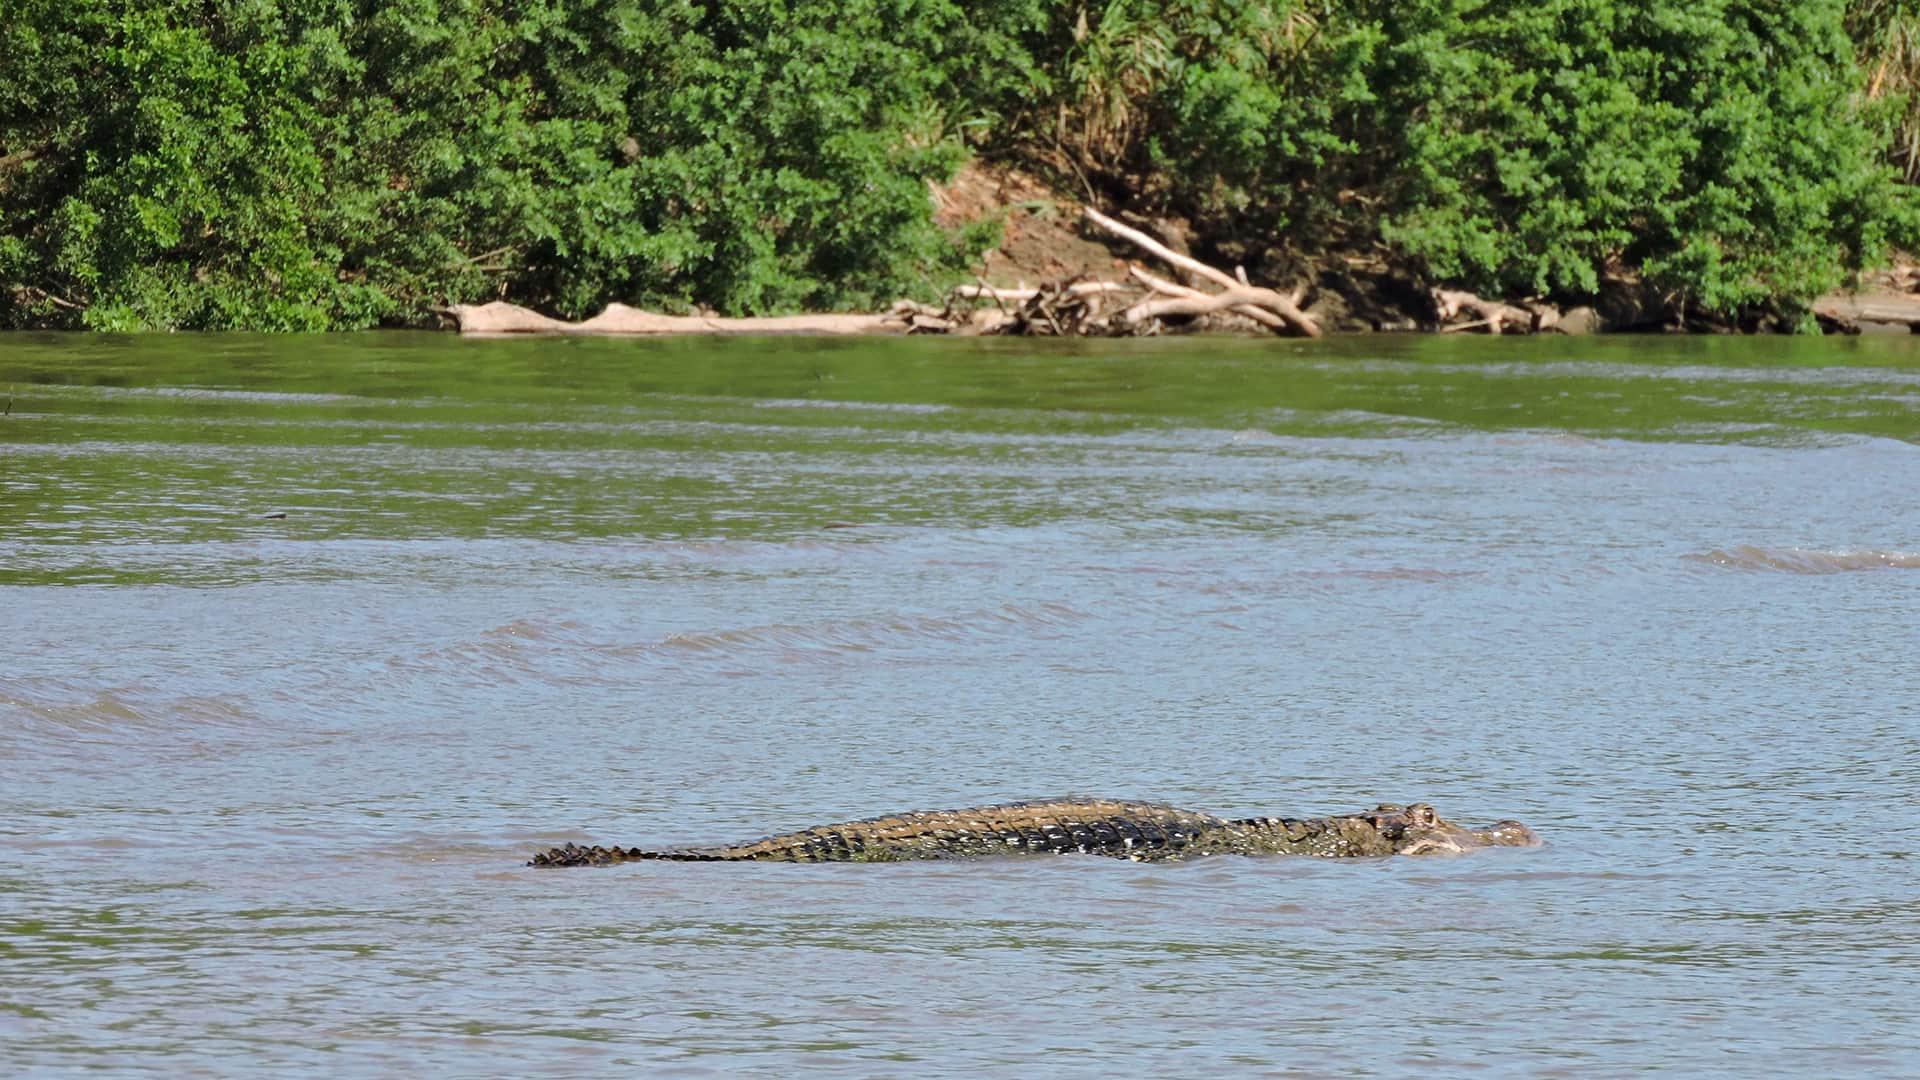 11caiman swimming in the river | Responsible Travel Peru